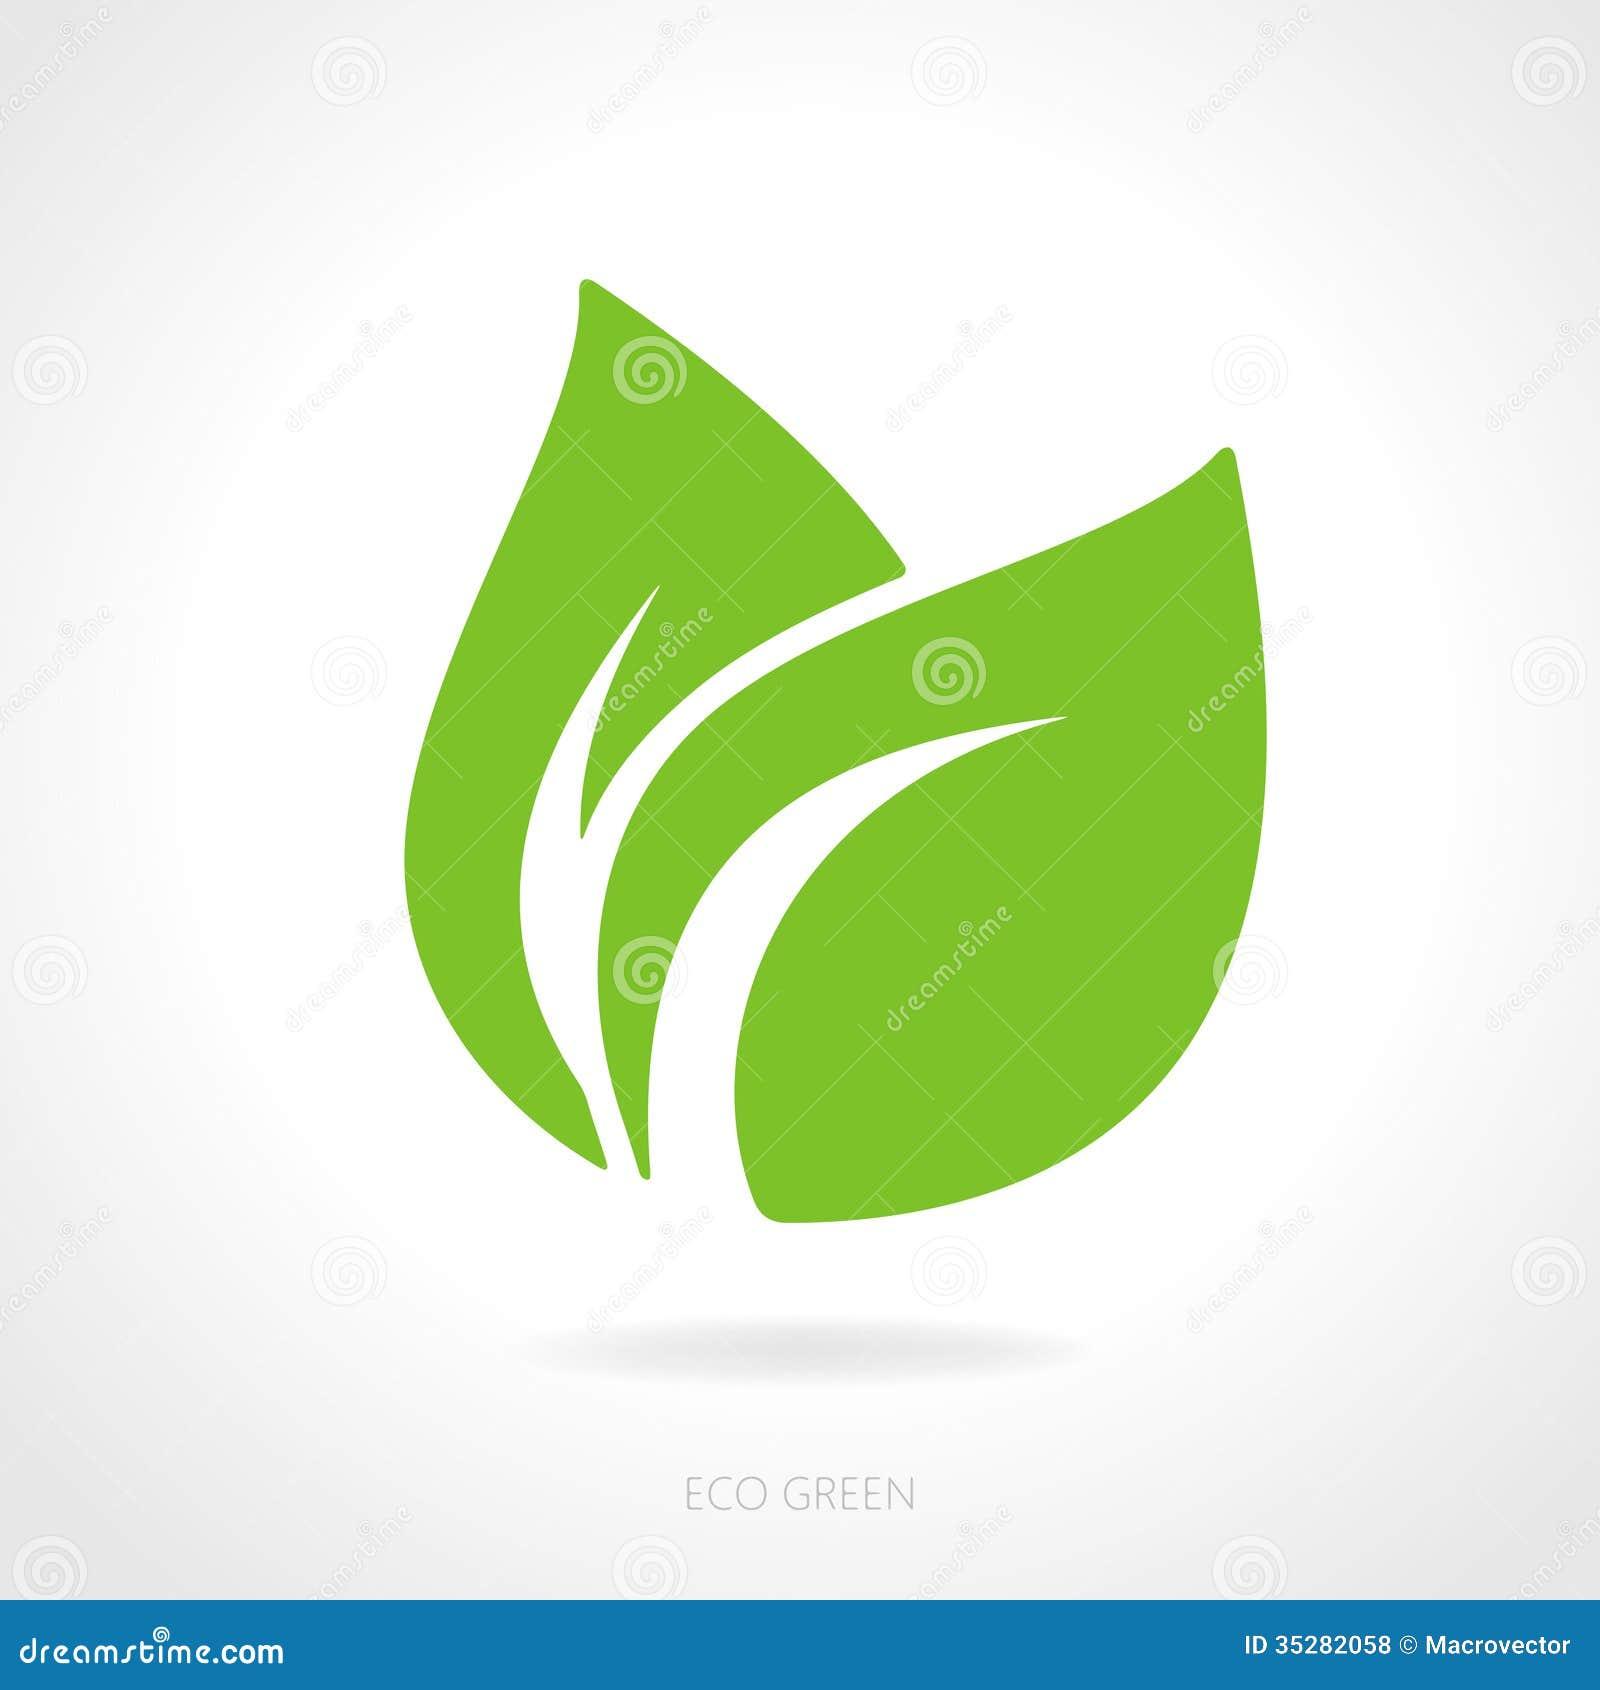 eco green leaf concept royalty free stock photos image 35282058 skyscraper city clipart skyscraper clipart free